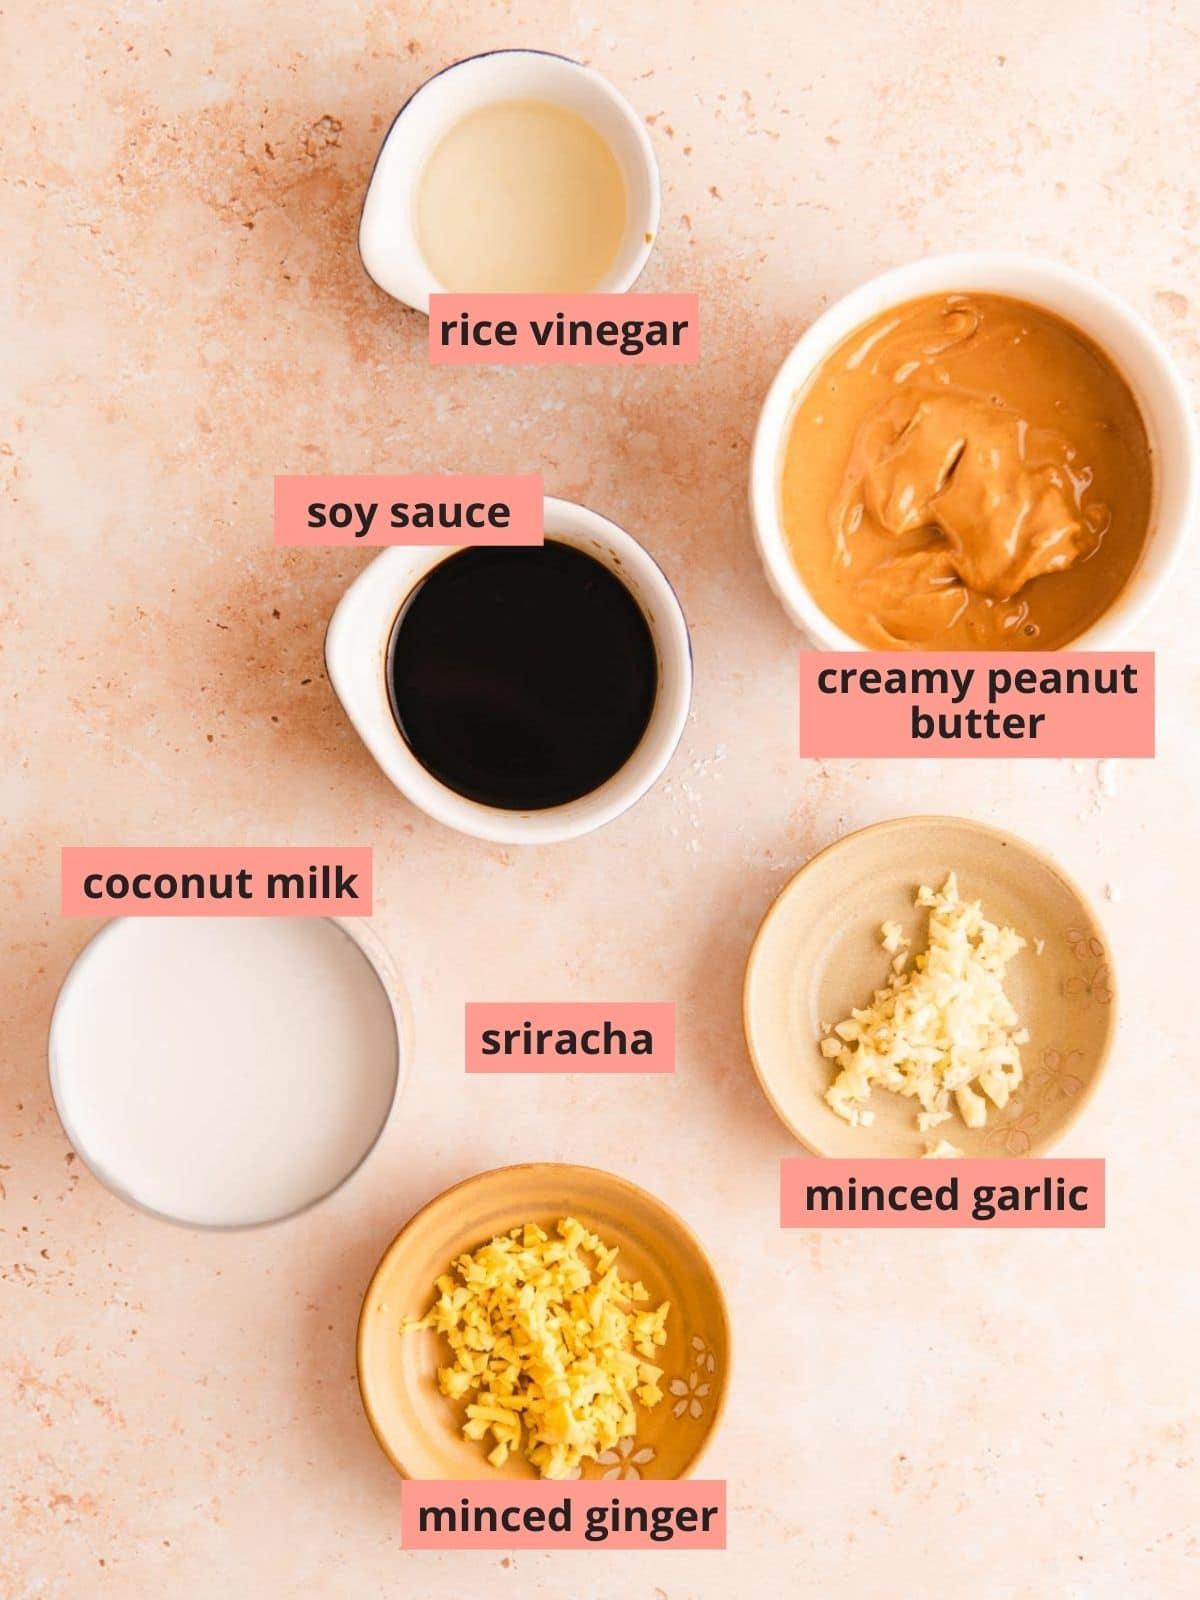 Labeled ingredients used to make peanut tofu